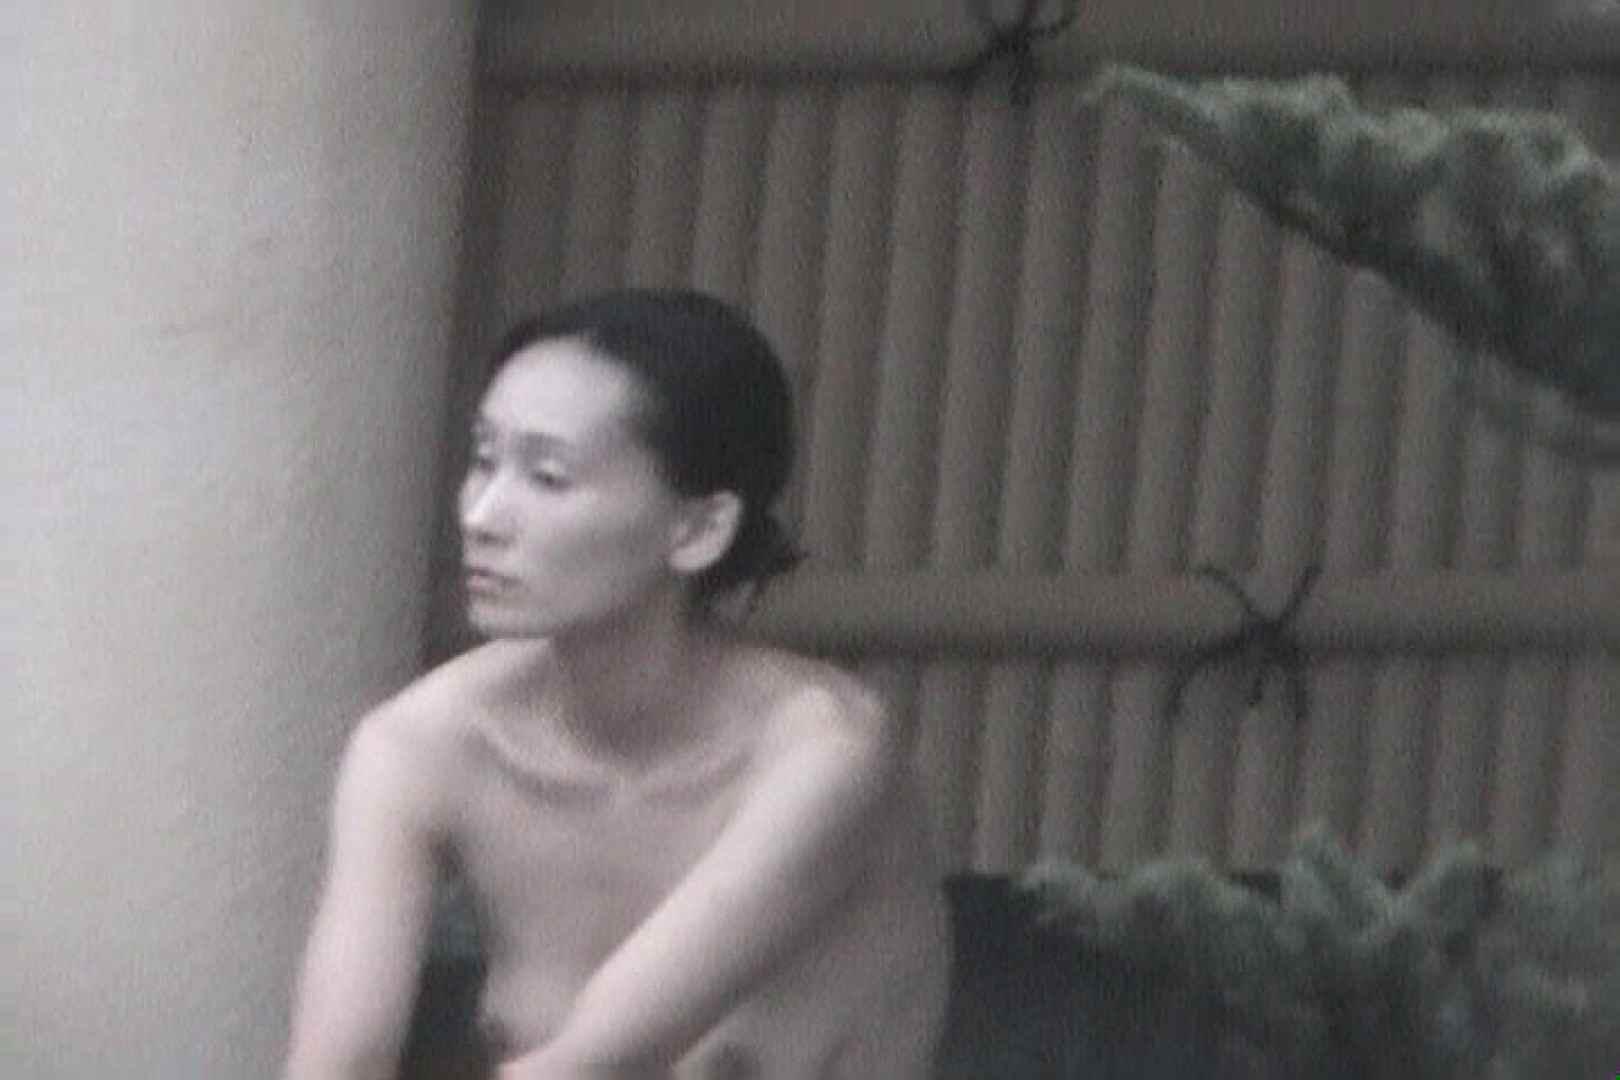 Aquaな露天風呂Vol.557 露天 われめAV動画紹介 78枚 56